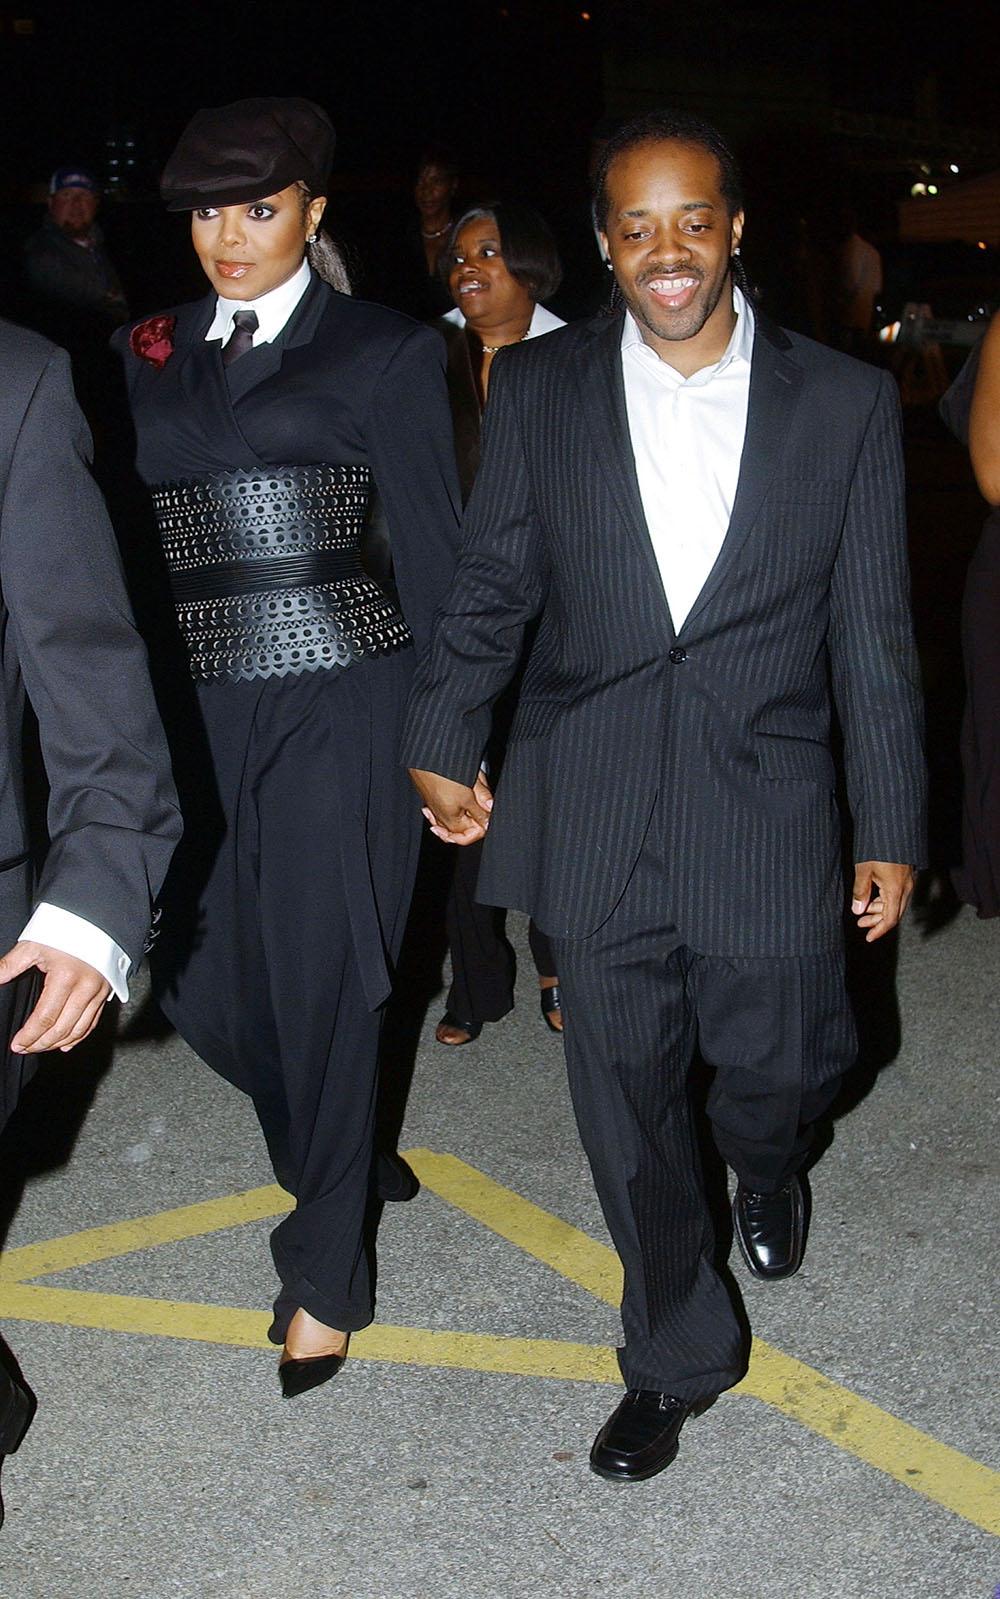 Jermaine Dupri Amp Janet Jackson At Jillian S In Louisville